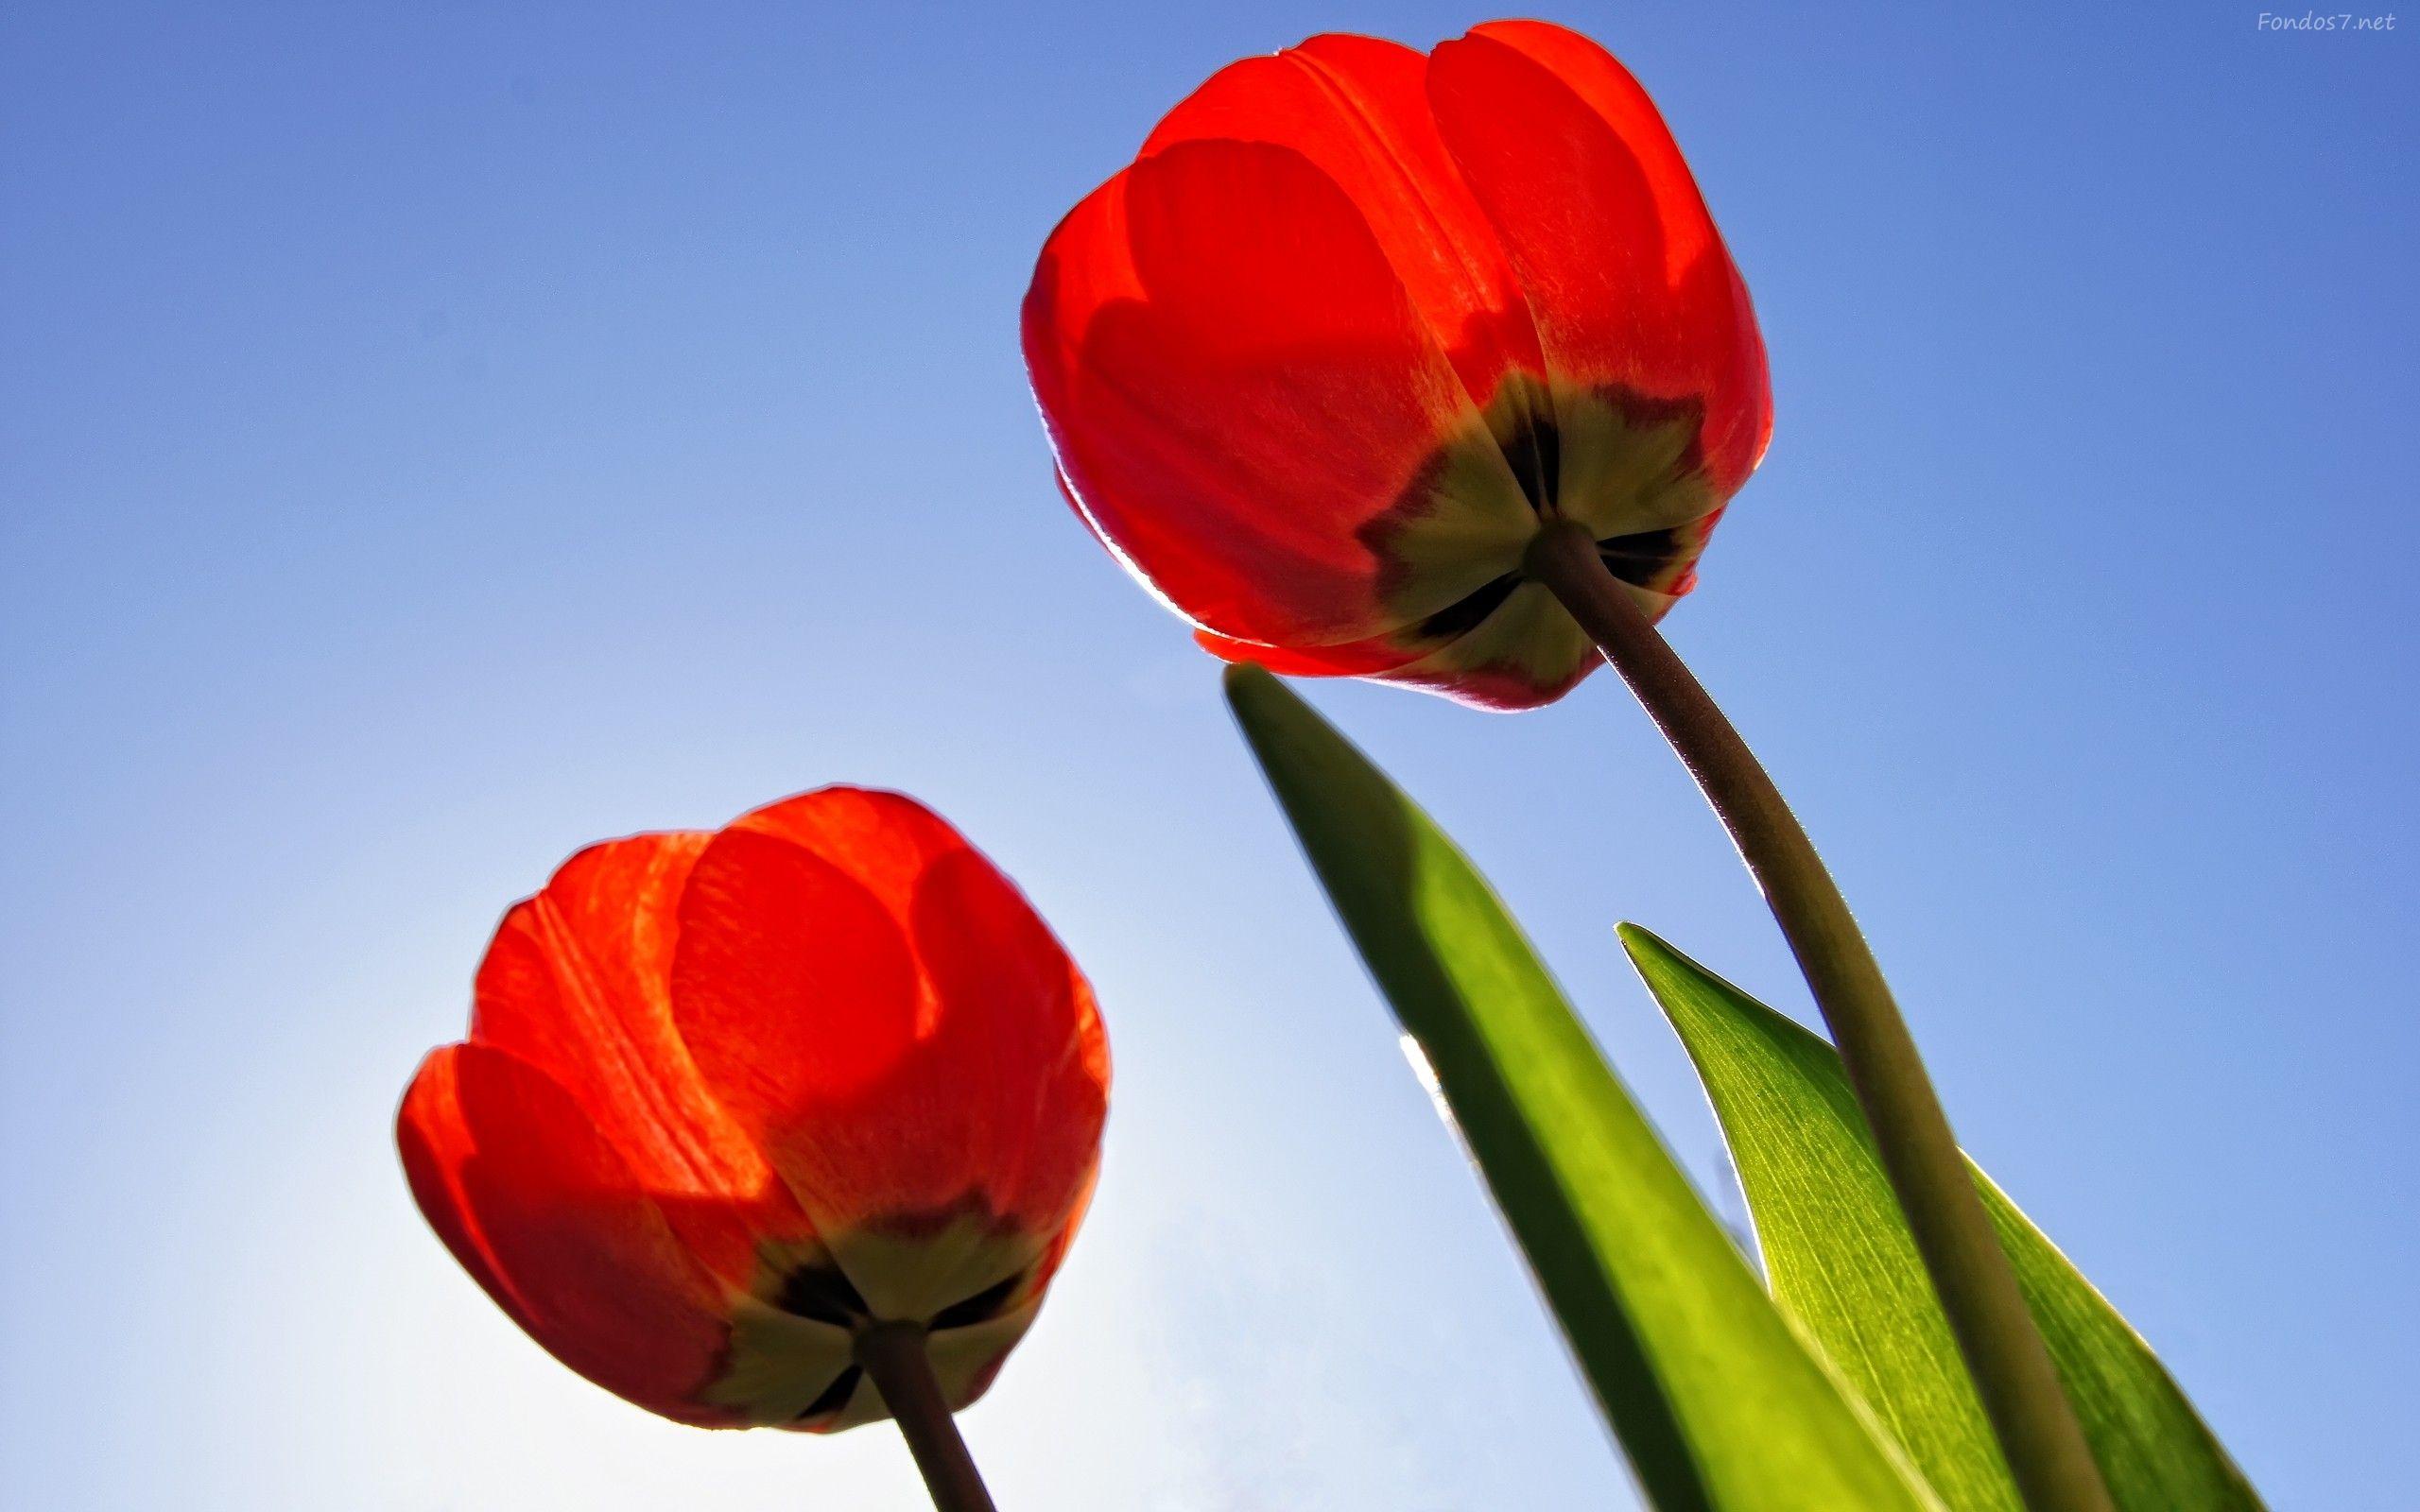 Fondos De Pantalla De Flores Hermosas Para Fondo Celular